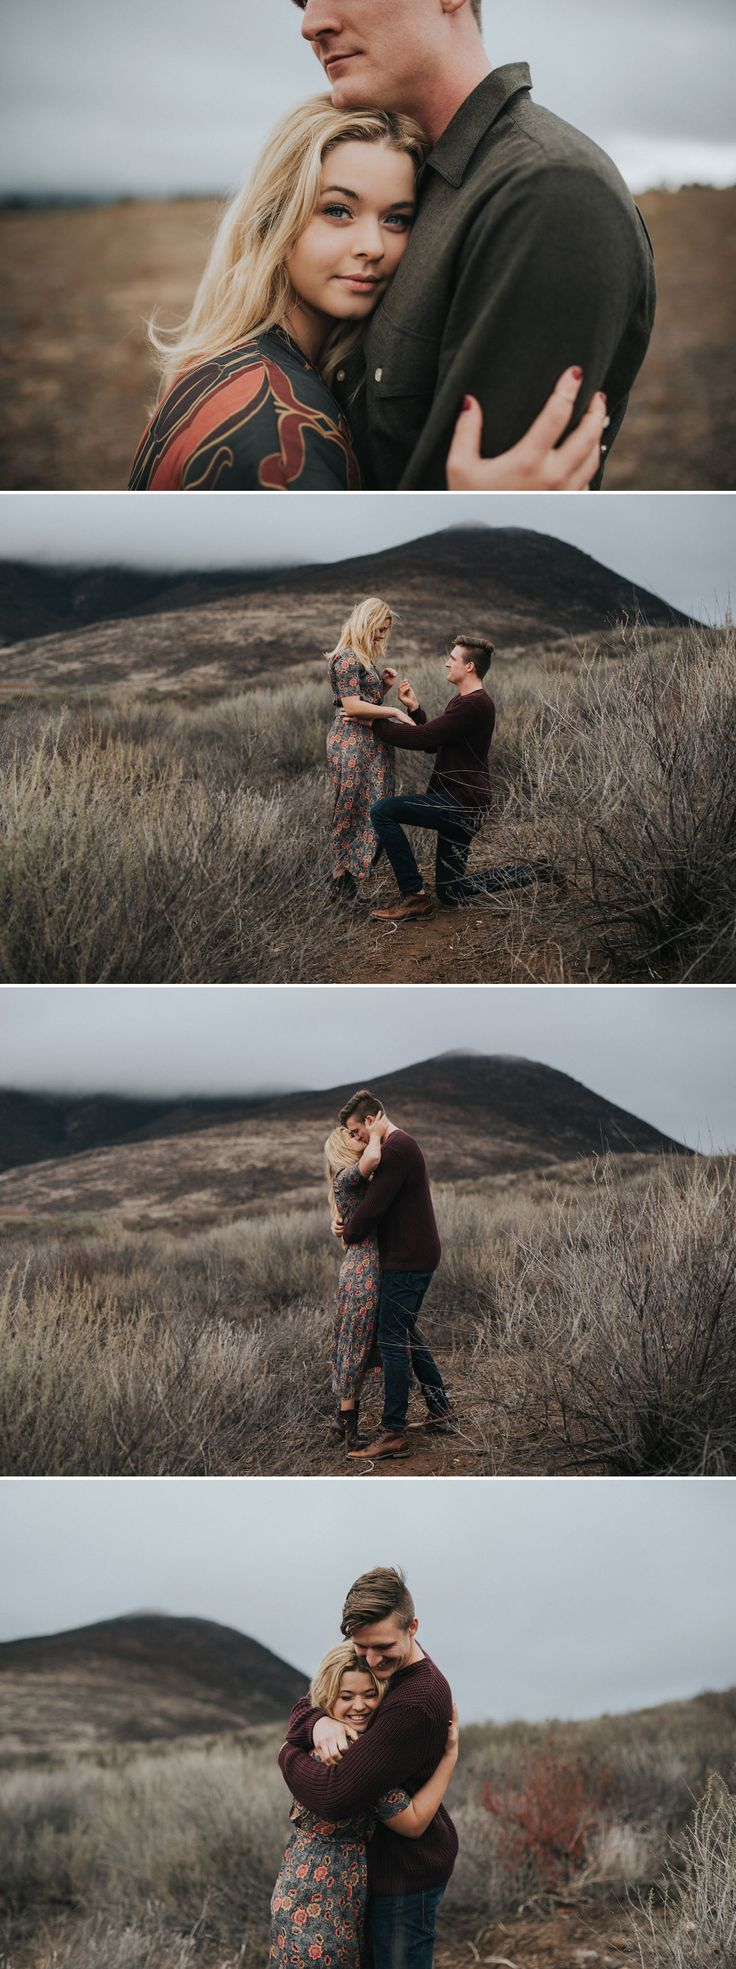 Pretty Little Liars star Sasha Pieterse's couple-shoot-turned-surprise-proposal